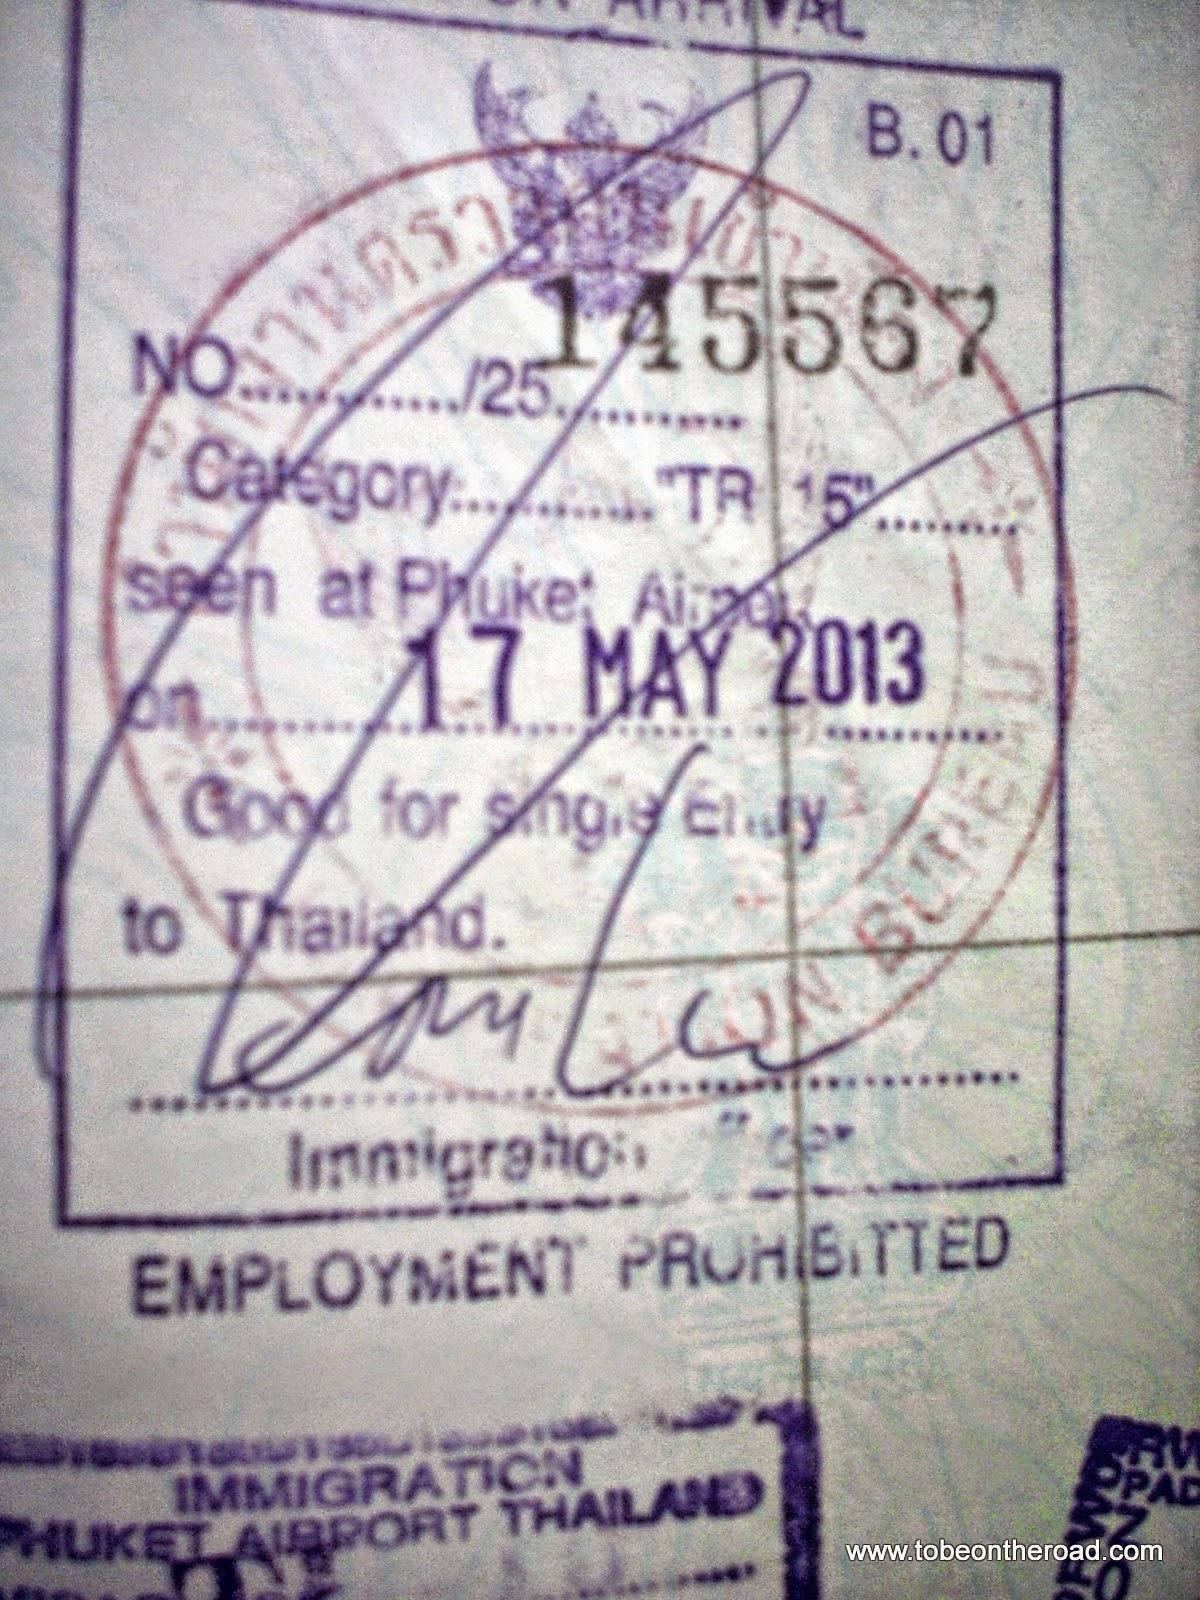 Visa,VOA,Phuket,Thailand,Maya Bay